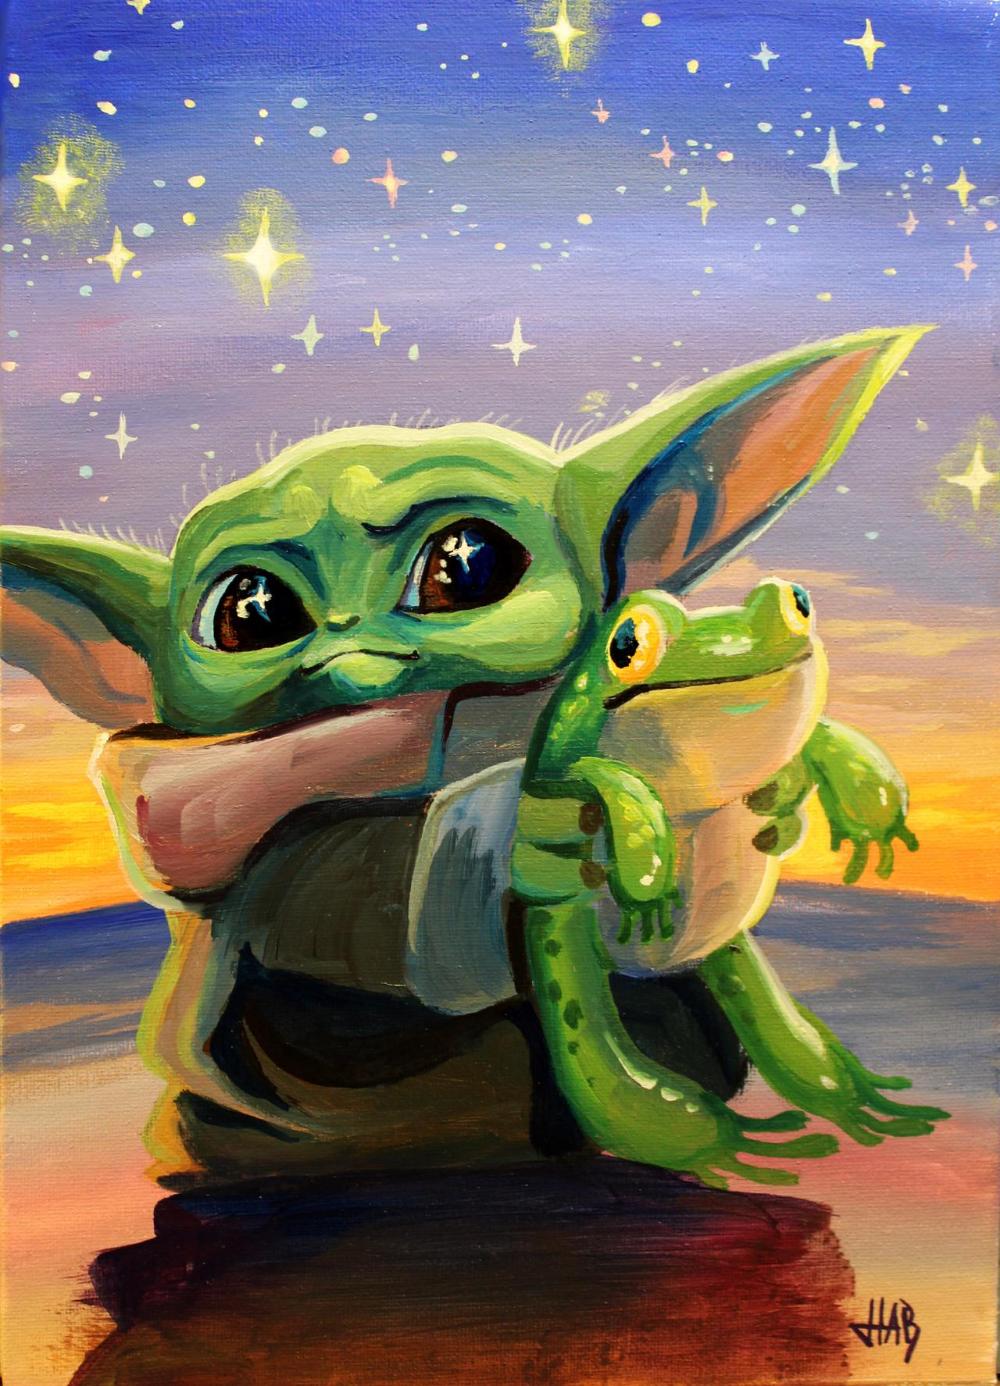 Baby Yoda Loves Frog By Snowboardleopard On Deviantart Yoda Art Star Wars Painting Yoda Artwork